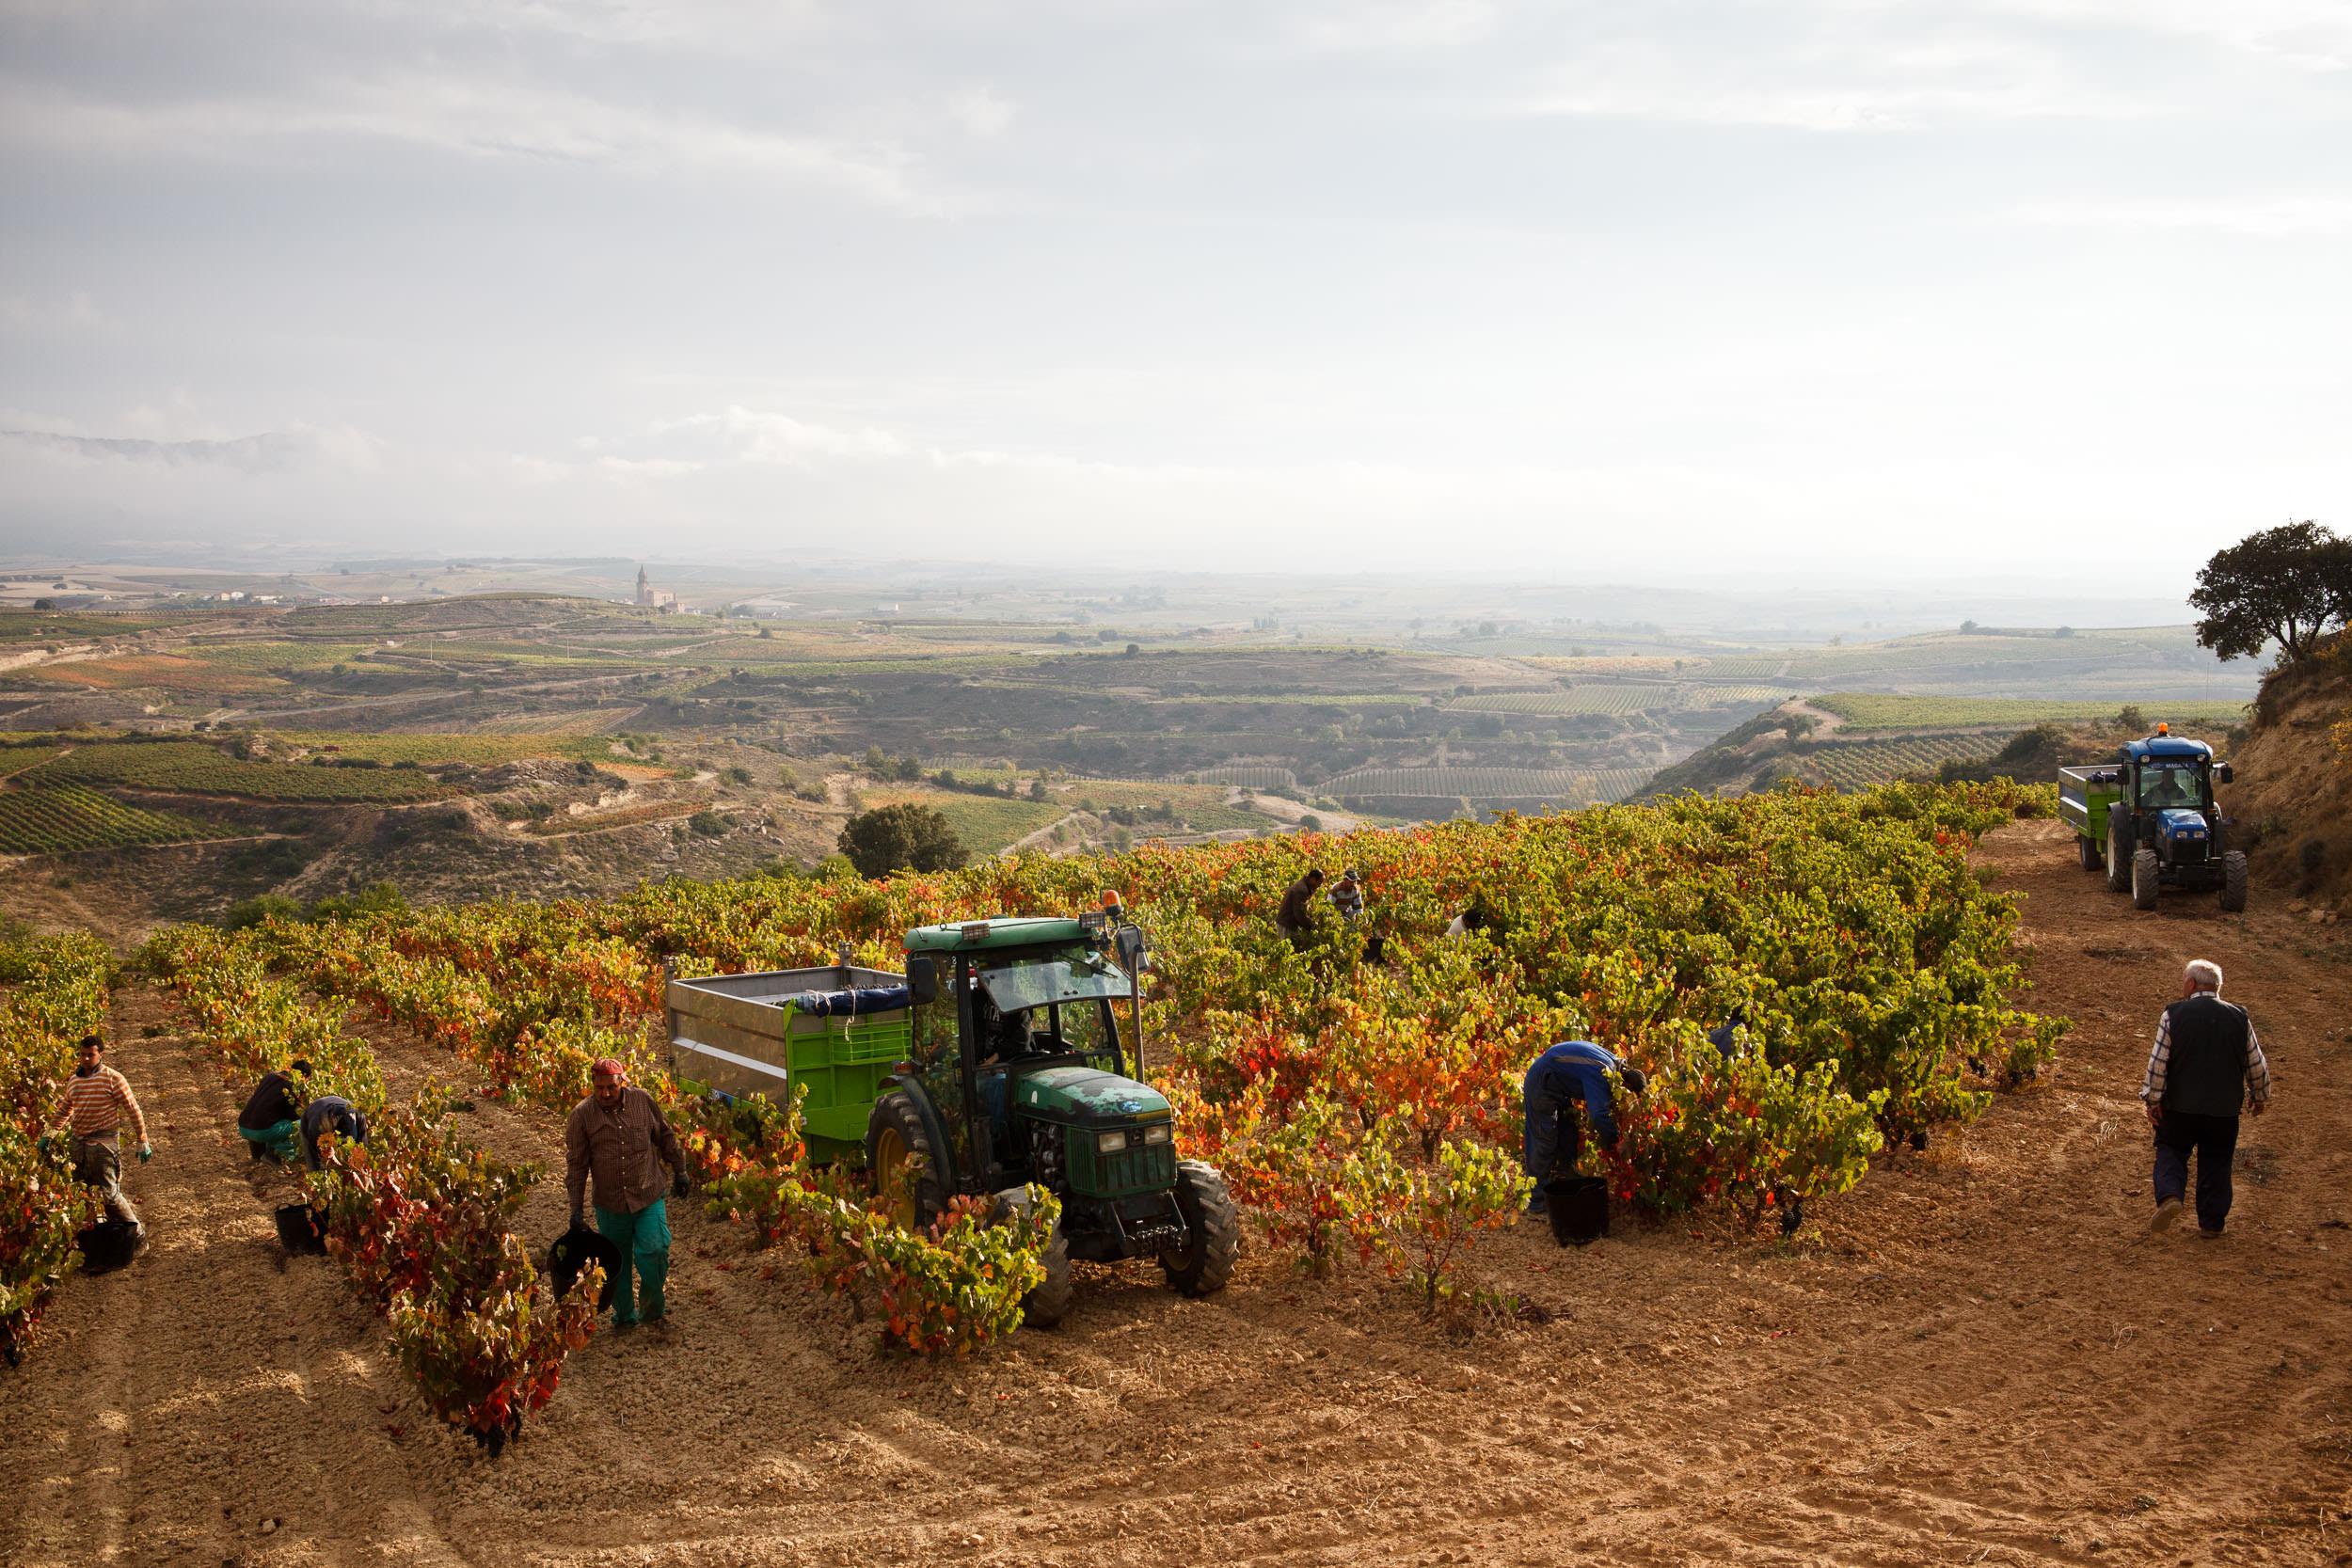 Mejor Fotografia Comercial y Editorial La Rioja y Pais Vasco Espana - James Sturcke - sturcke.org_006.jpg